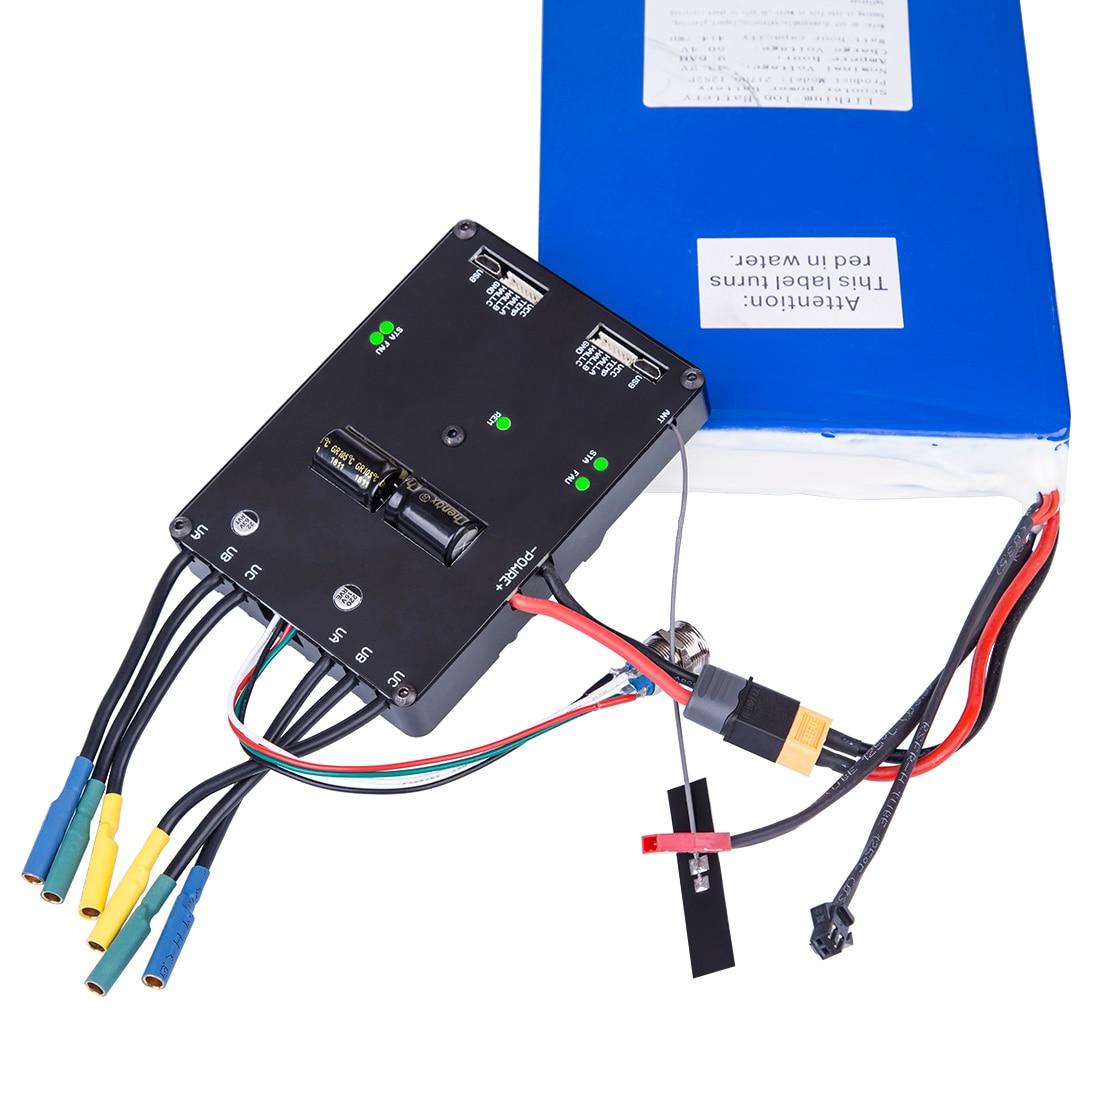 New ESC6.1 Dual Drive ESC 100A 8-60V 3S-12S Battery With Case